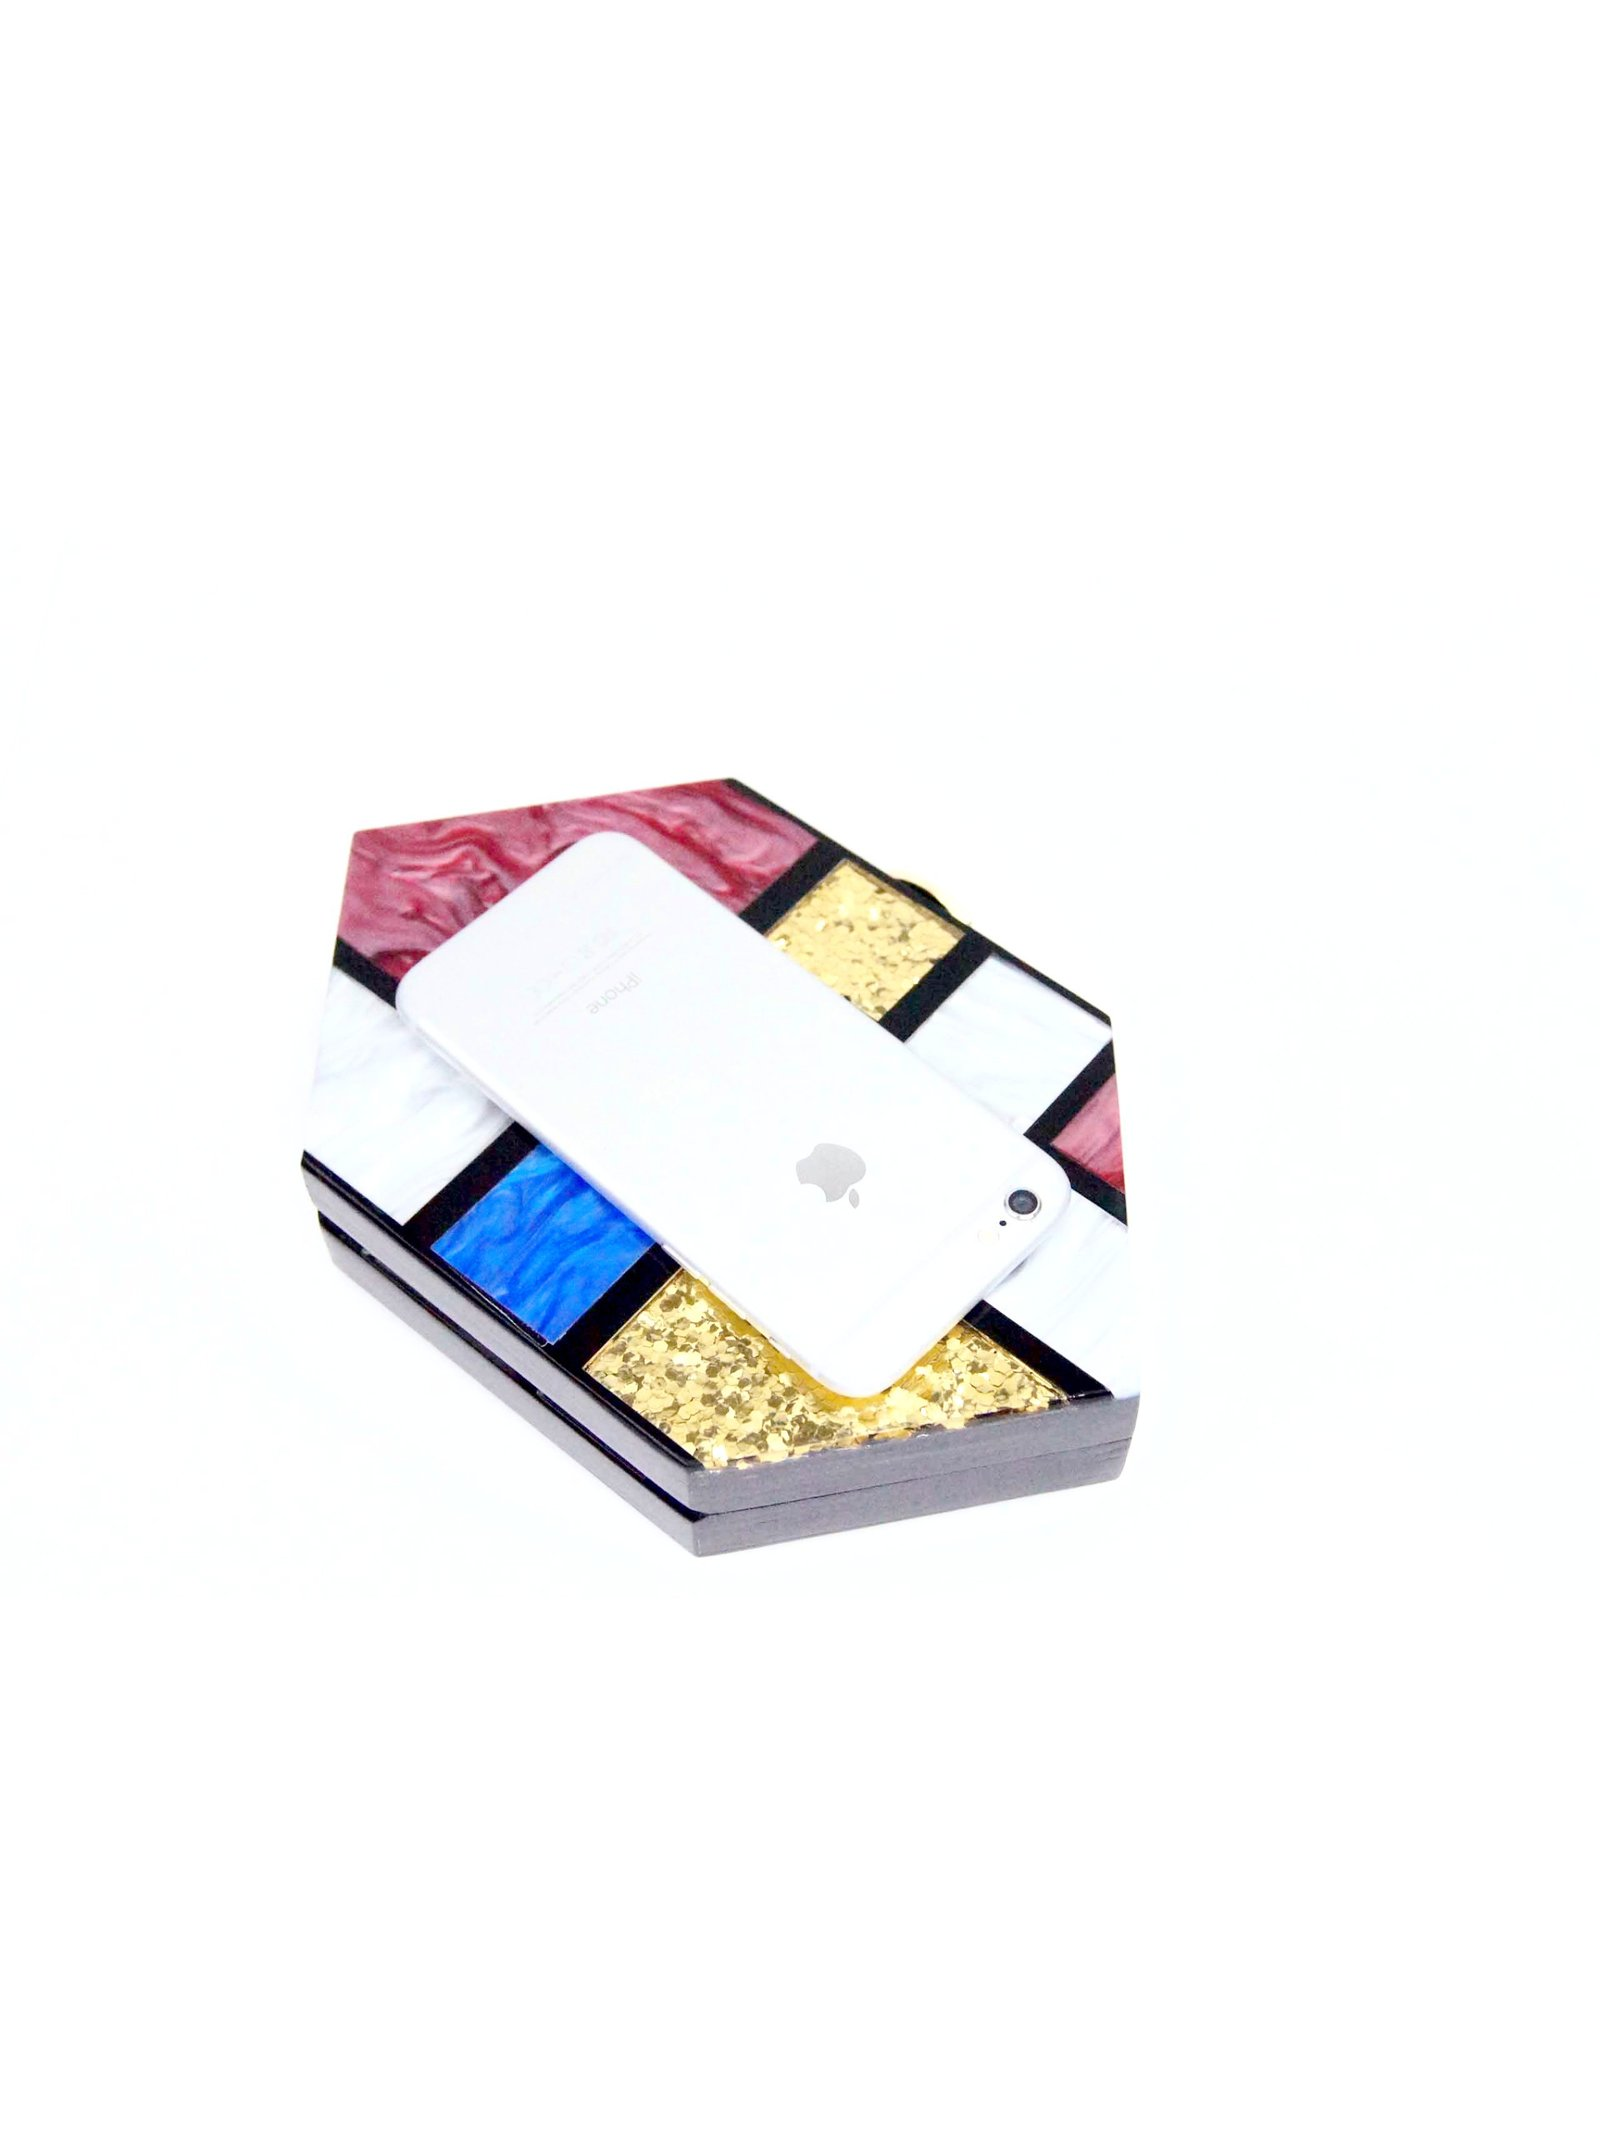 Milanblocks Black Acrylic Mondrian Clutch